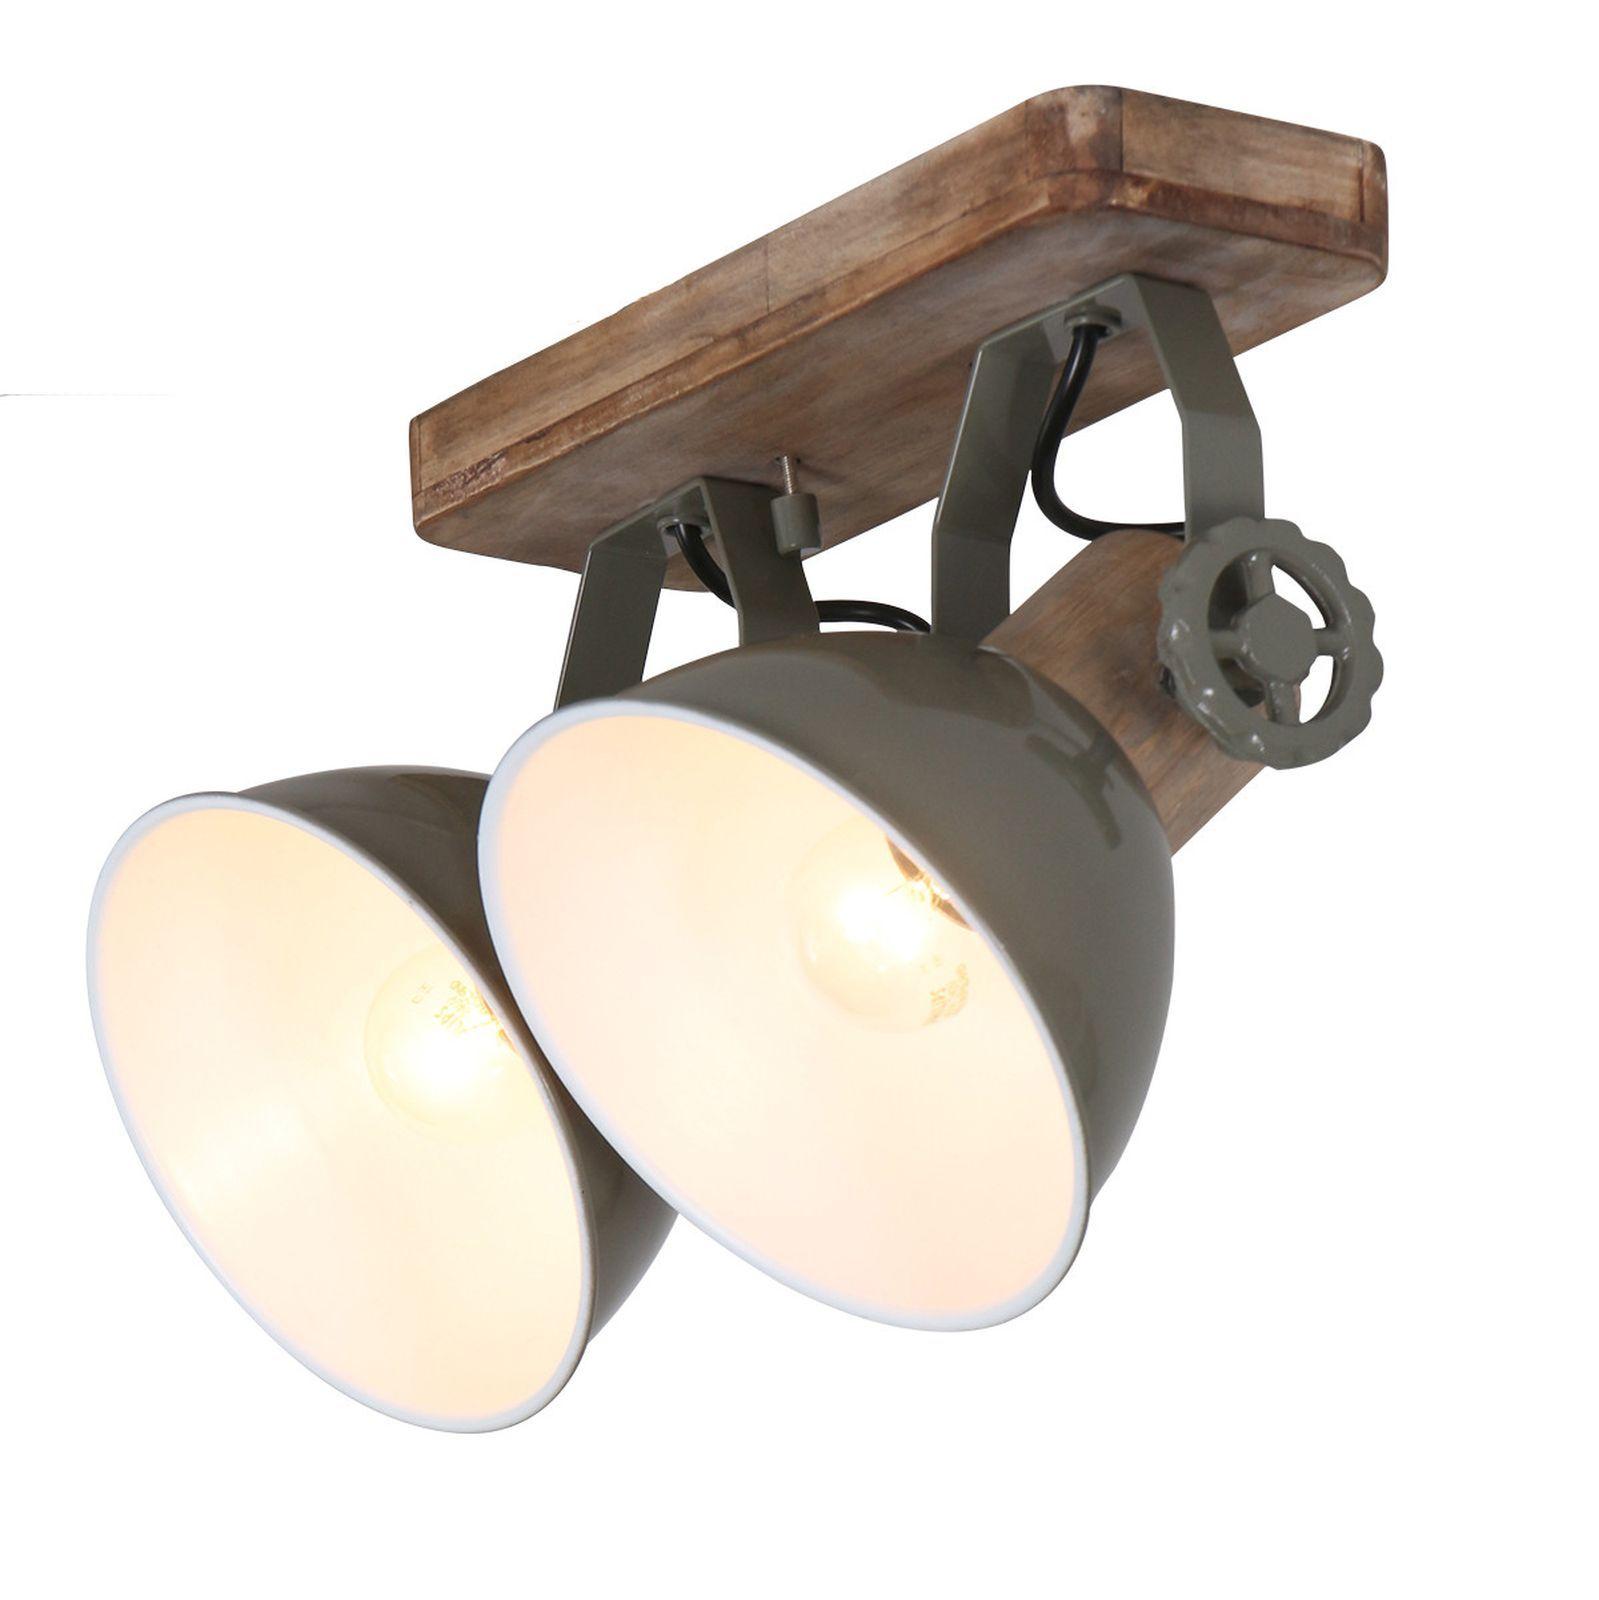 Deckenleuchte 2er Spot Steinhauer 7969g Mexlite Wandlampe Vintage E27 Deckenlampe Holz Lampe Lampen Bad